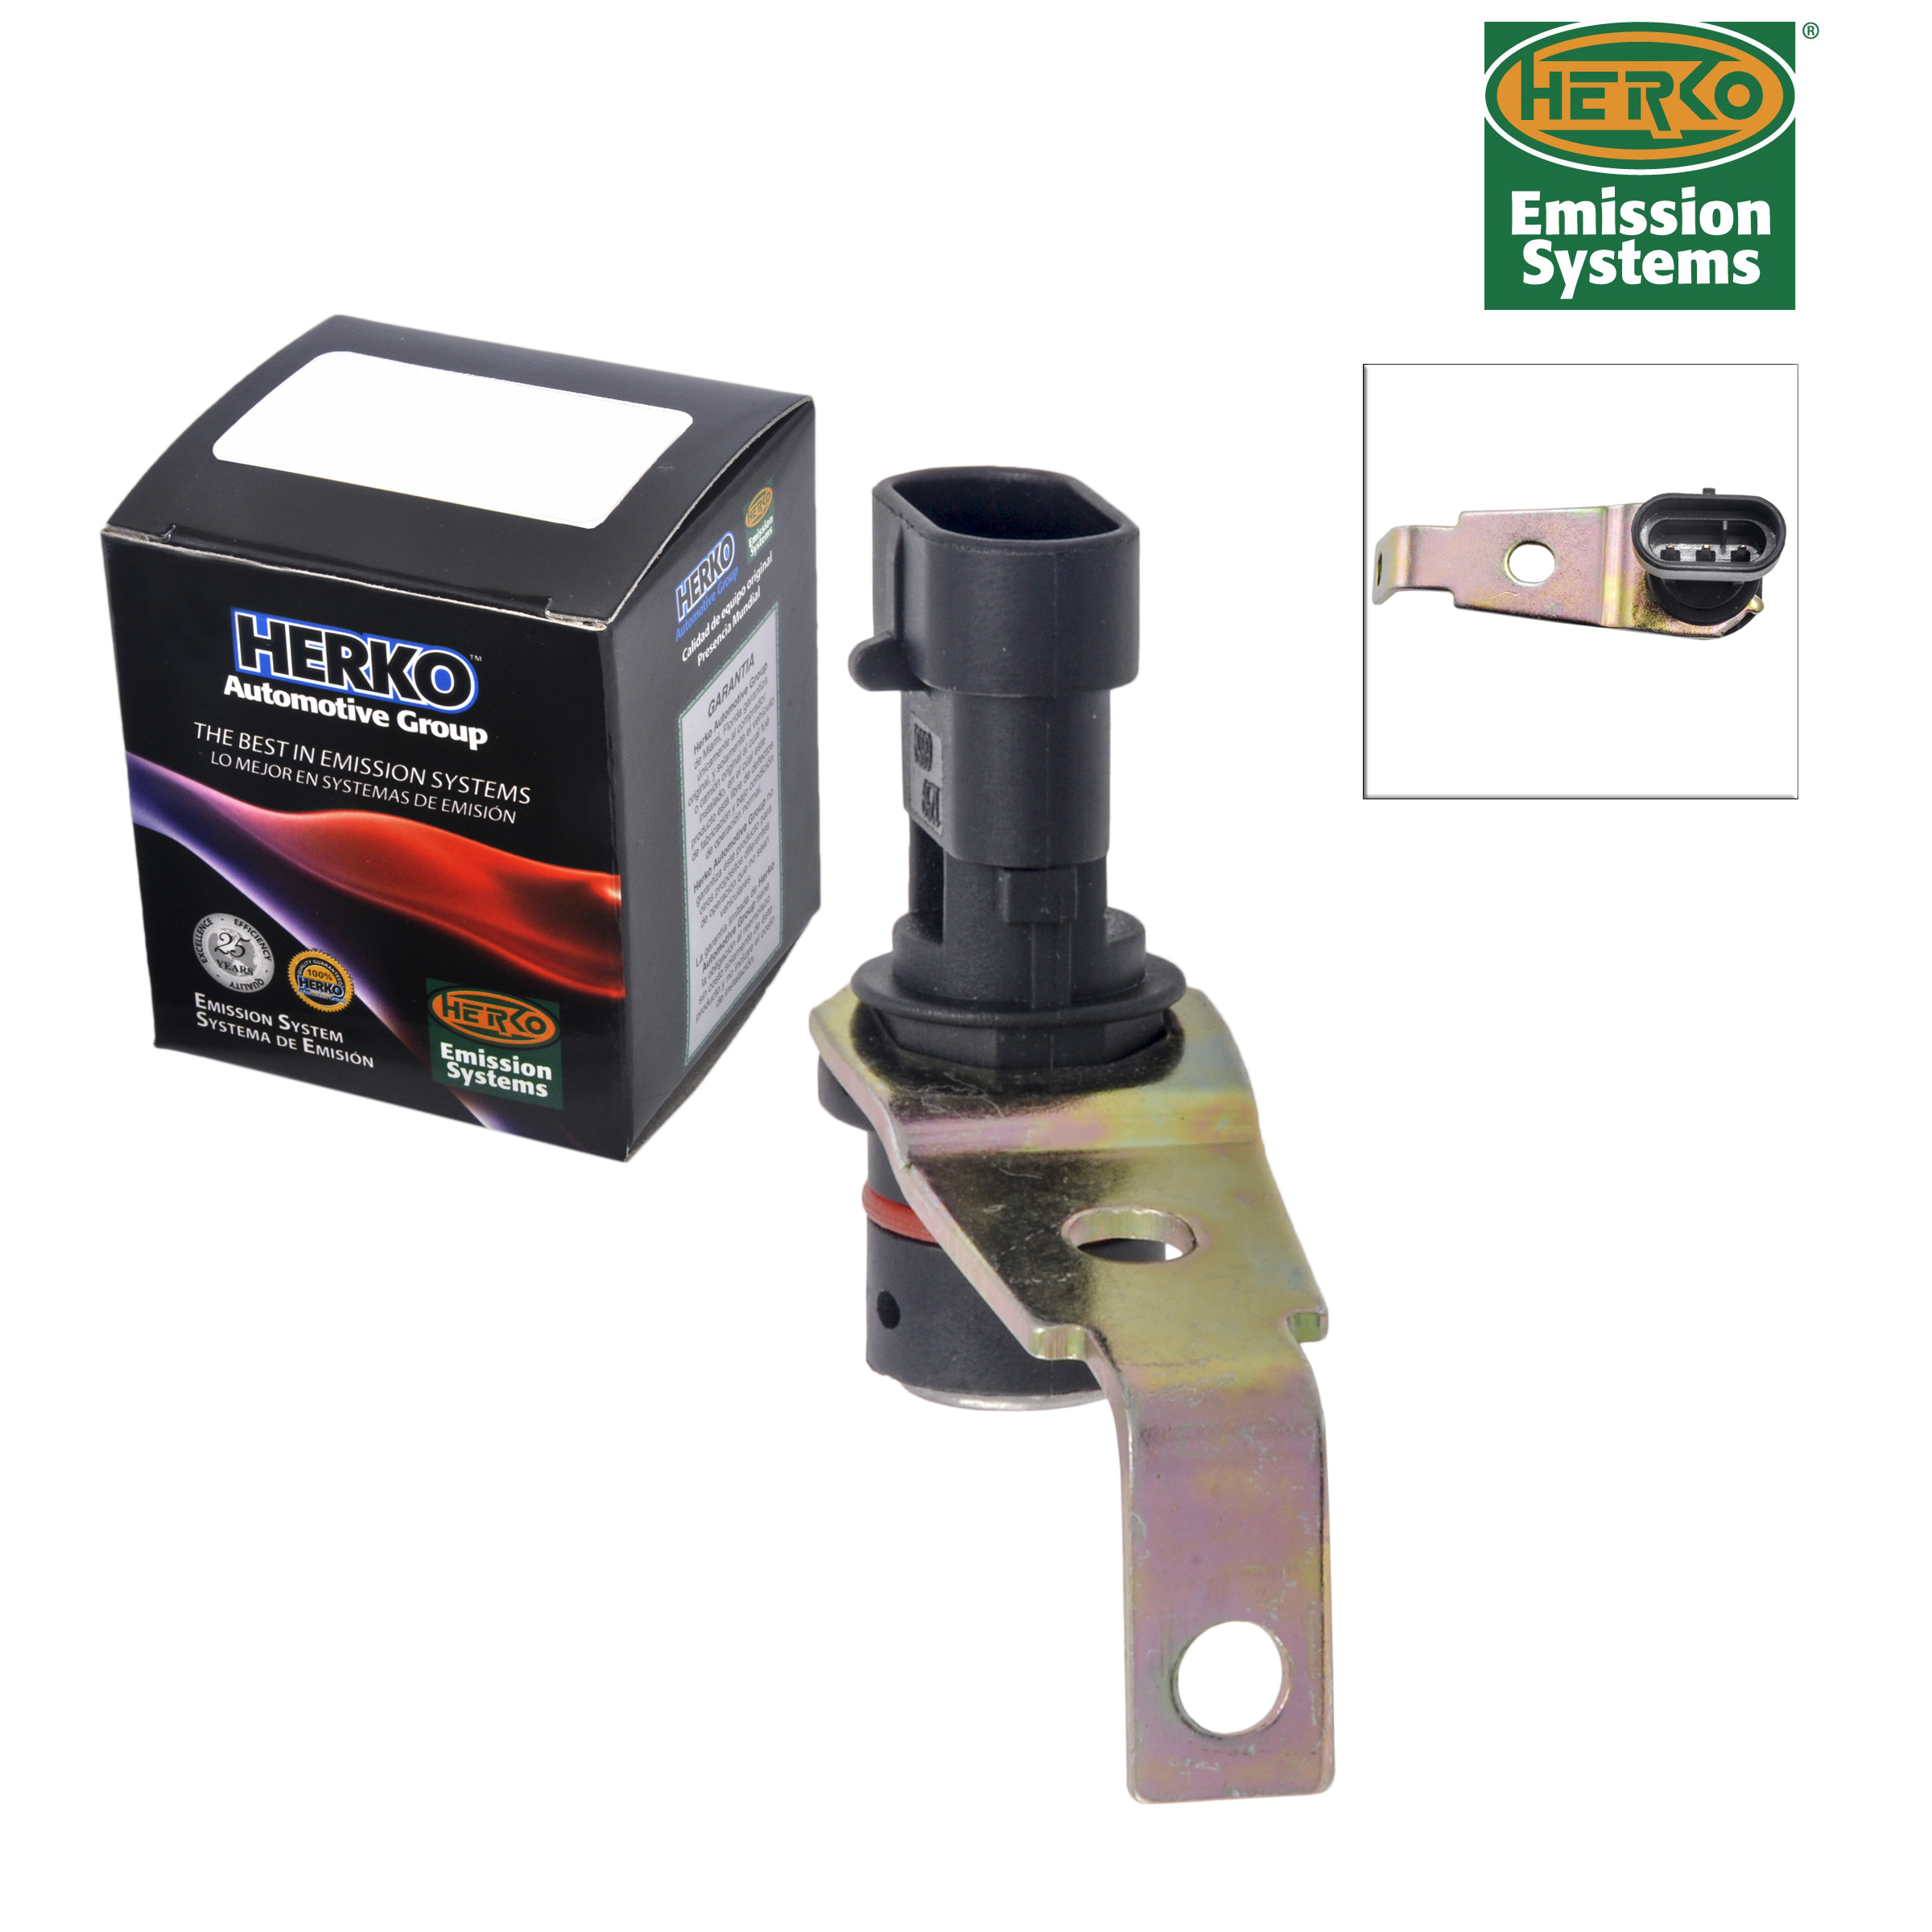 New Herko Crankshaft Position Sensor CKP2015 For Cadillac